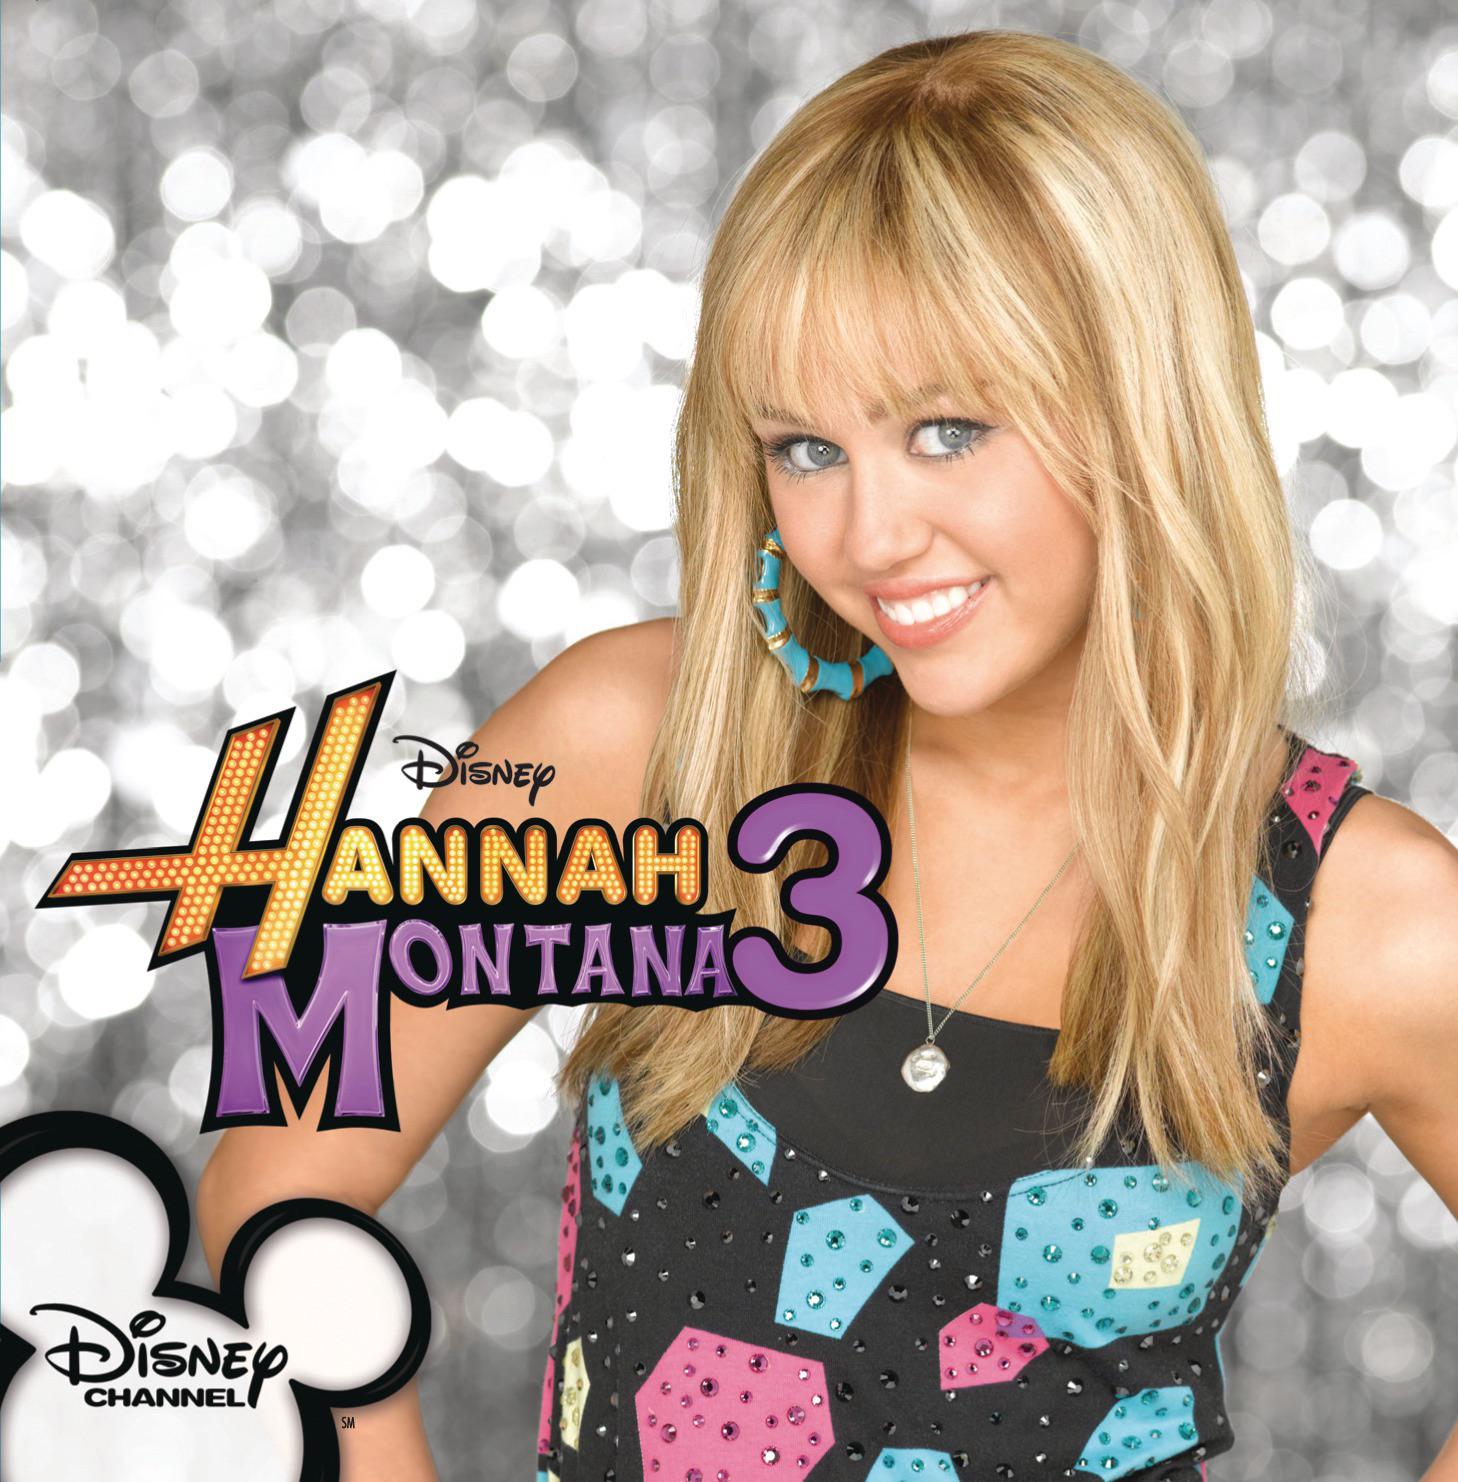 Fil:DisneyHM2Soundtrack3.png